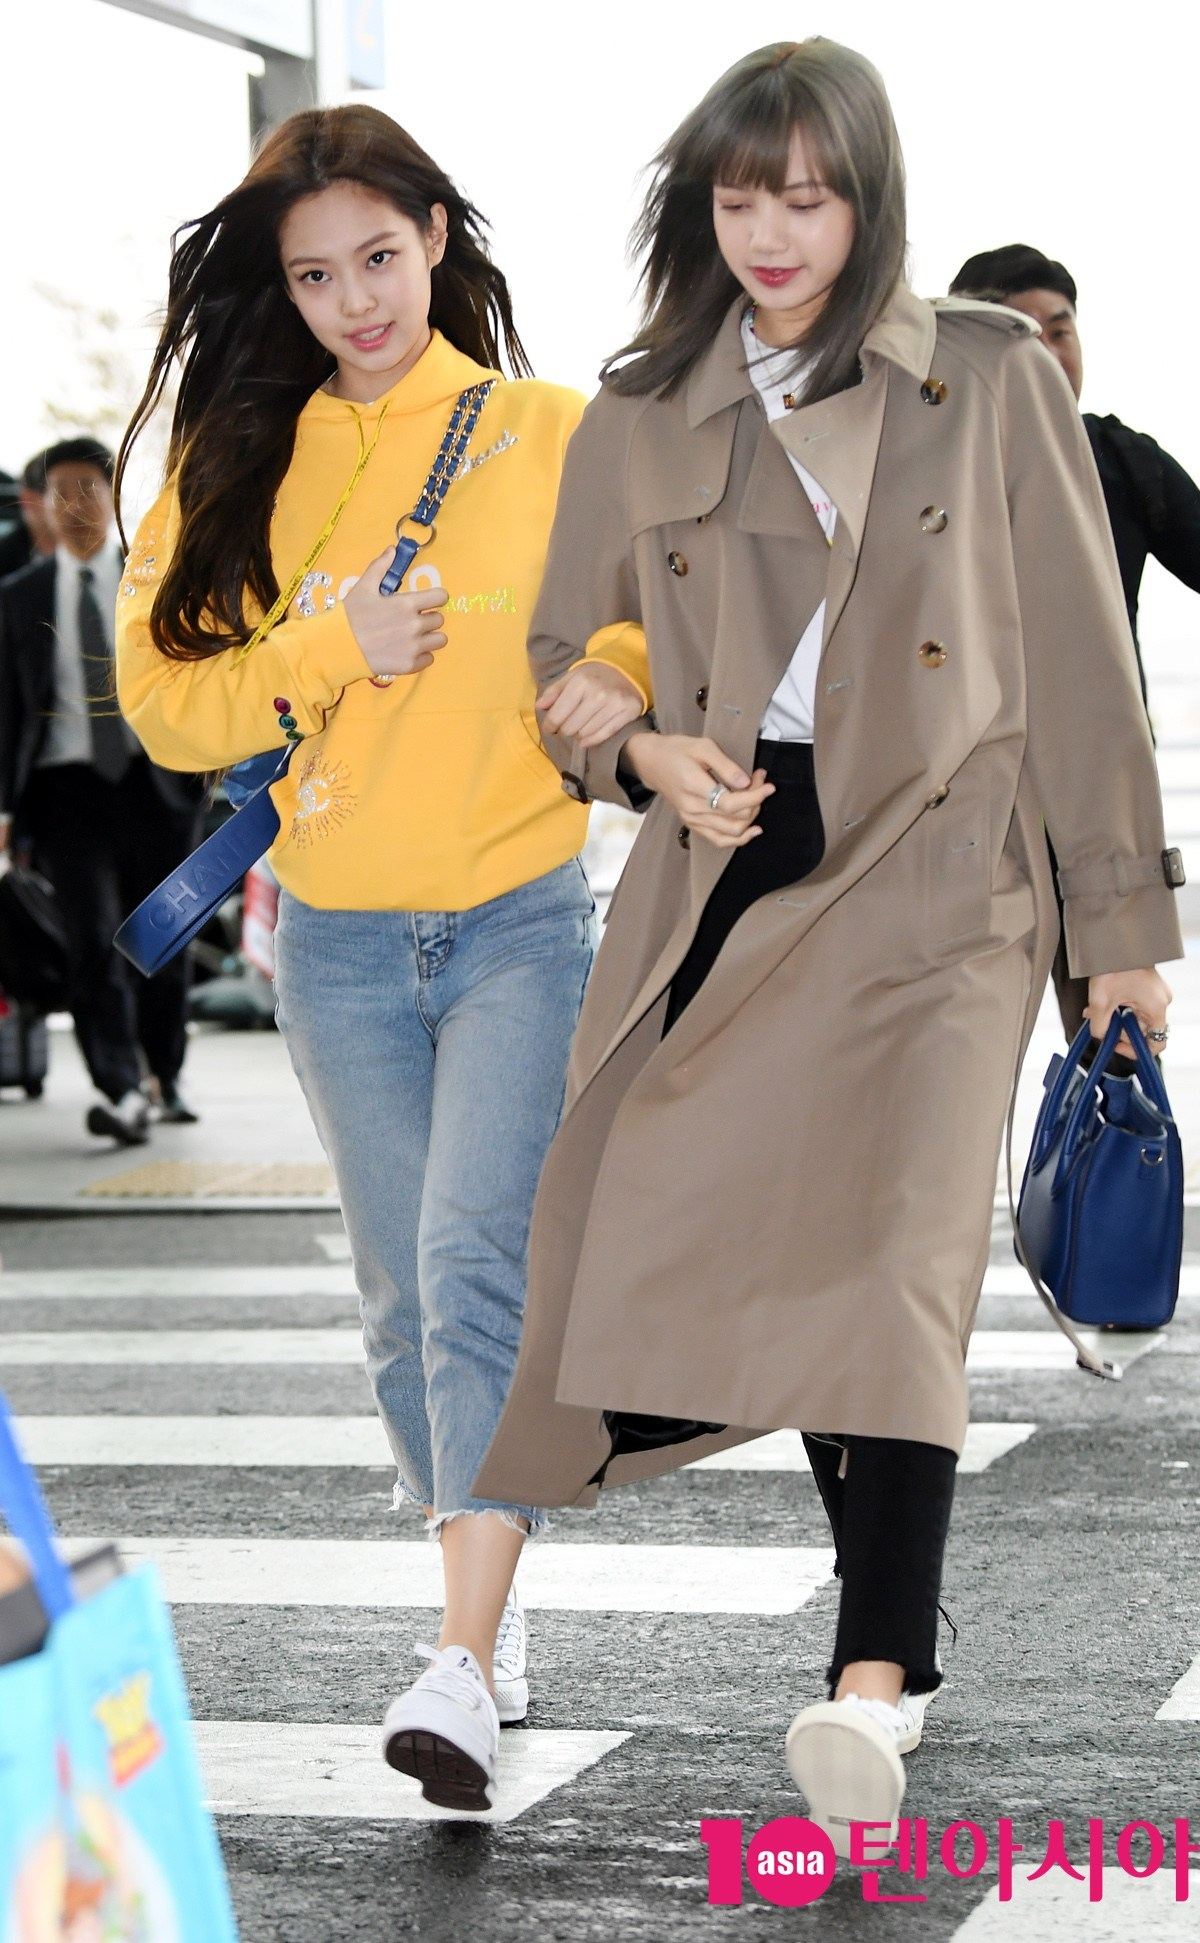 4-BLACKPINK-Jennie-airport-Photo-9-April-2019-Incheon-to-Thailand (1)